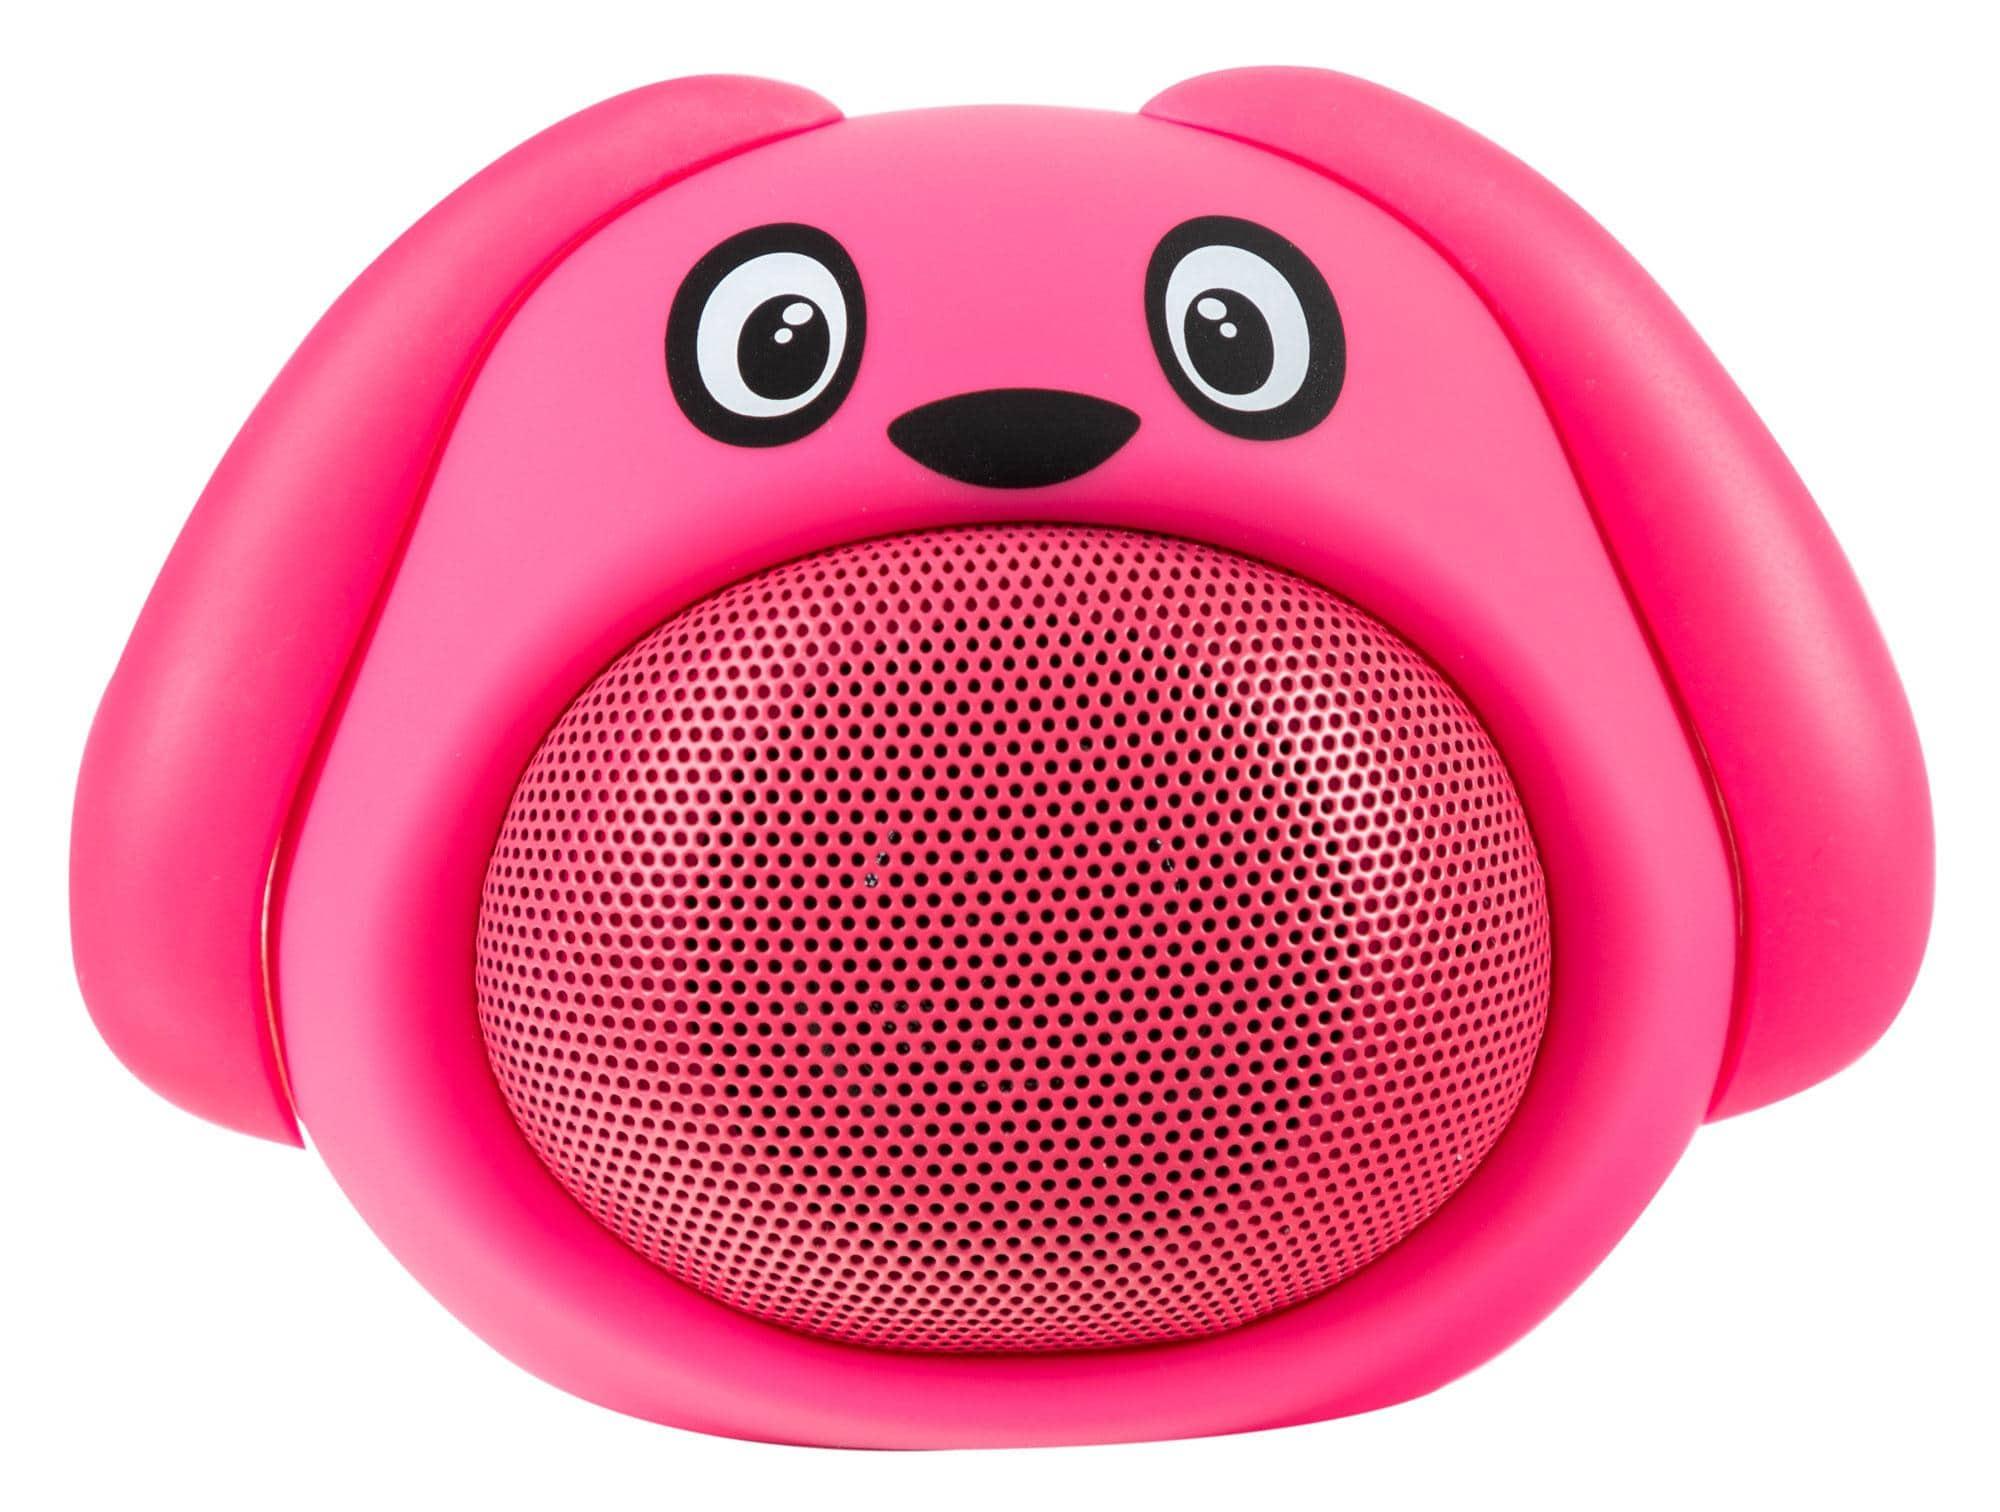 icutes bluetooth lautsprecher dog pink. Black Bedroom Furniture Sets. Home Design Ideas